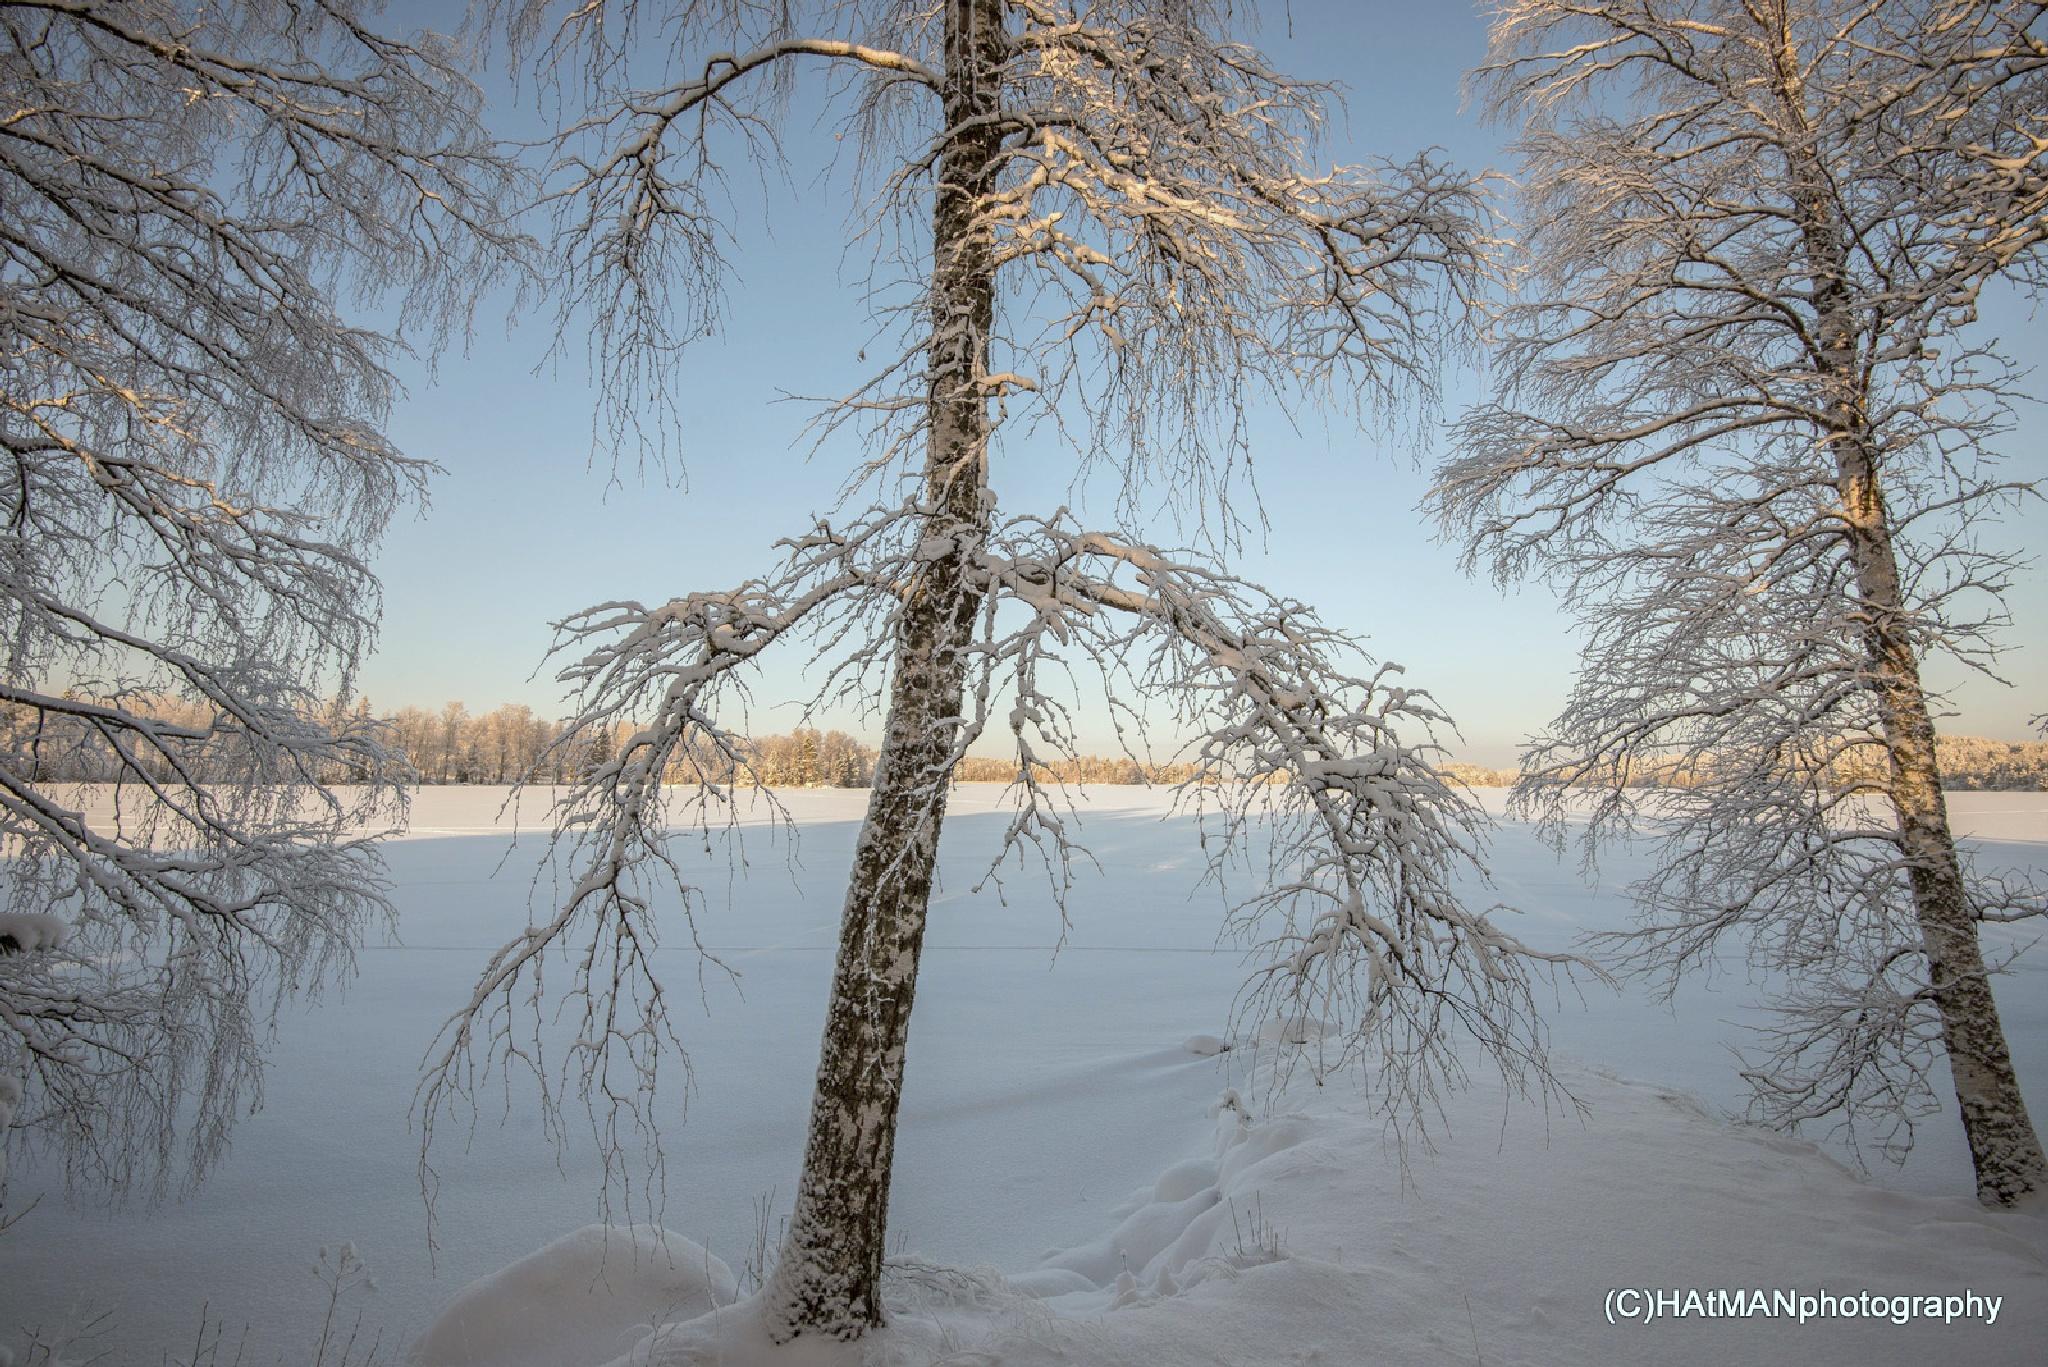 Untitled by HeikkiHAtMAN PHOTOGRAPHY